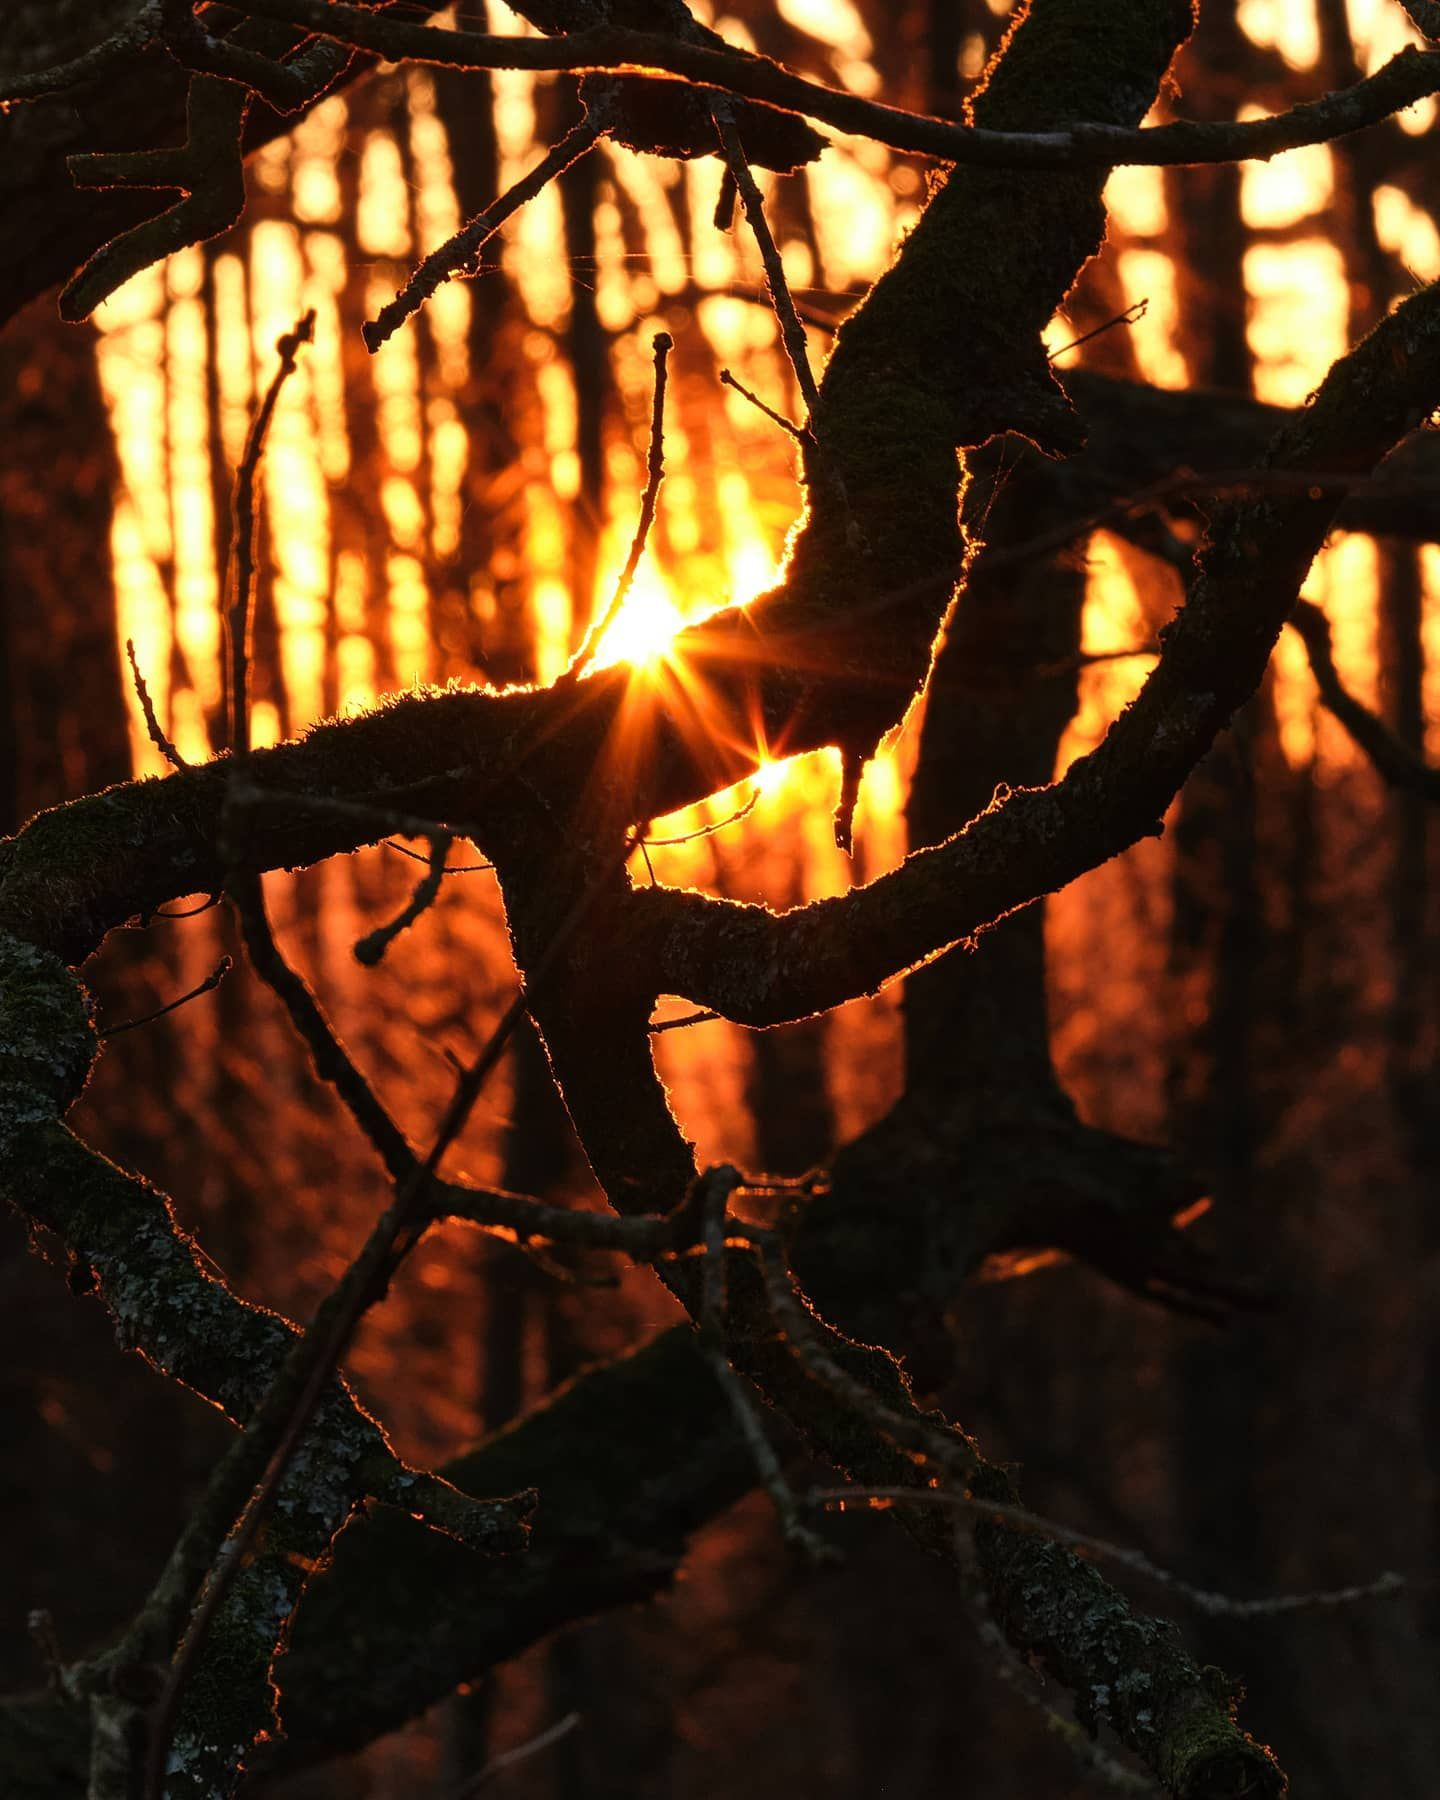 Sunset Branches   Leusden .  Fujiflim X-T30  XF55-200mm   ƒ/16   1/30   200 mm   ISO800  Leusden The Netherlands . . . . . . #Staycreativeathome @fujifilmnederland #fujifilmnederland #avondfotografie #CaptureOne #fujixt30 #fujixseries #explore_nature #landscapelovers #natures_moods  #loves_united_nature #splendid_trees #naturemood #moody_captures #natures_mood #gottalove_a  #treesunset #sunsetbehindtrees #instasunsets_trees #sunsetthroughtrees #explore_landscapes #trees #naturepix #earthshot #su